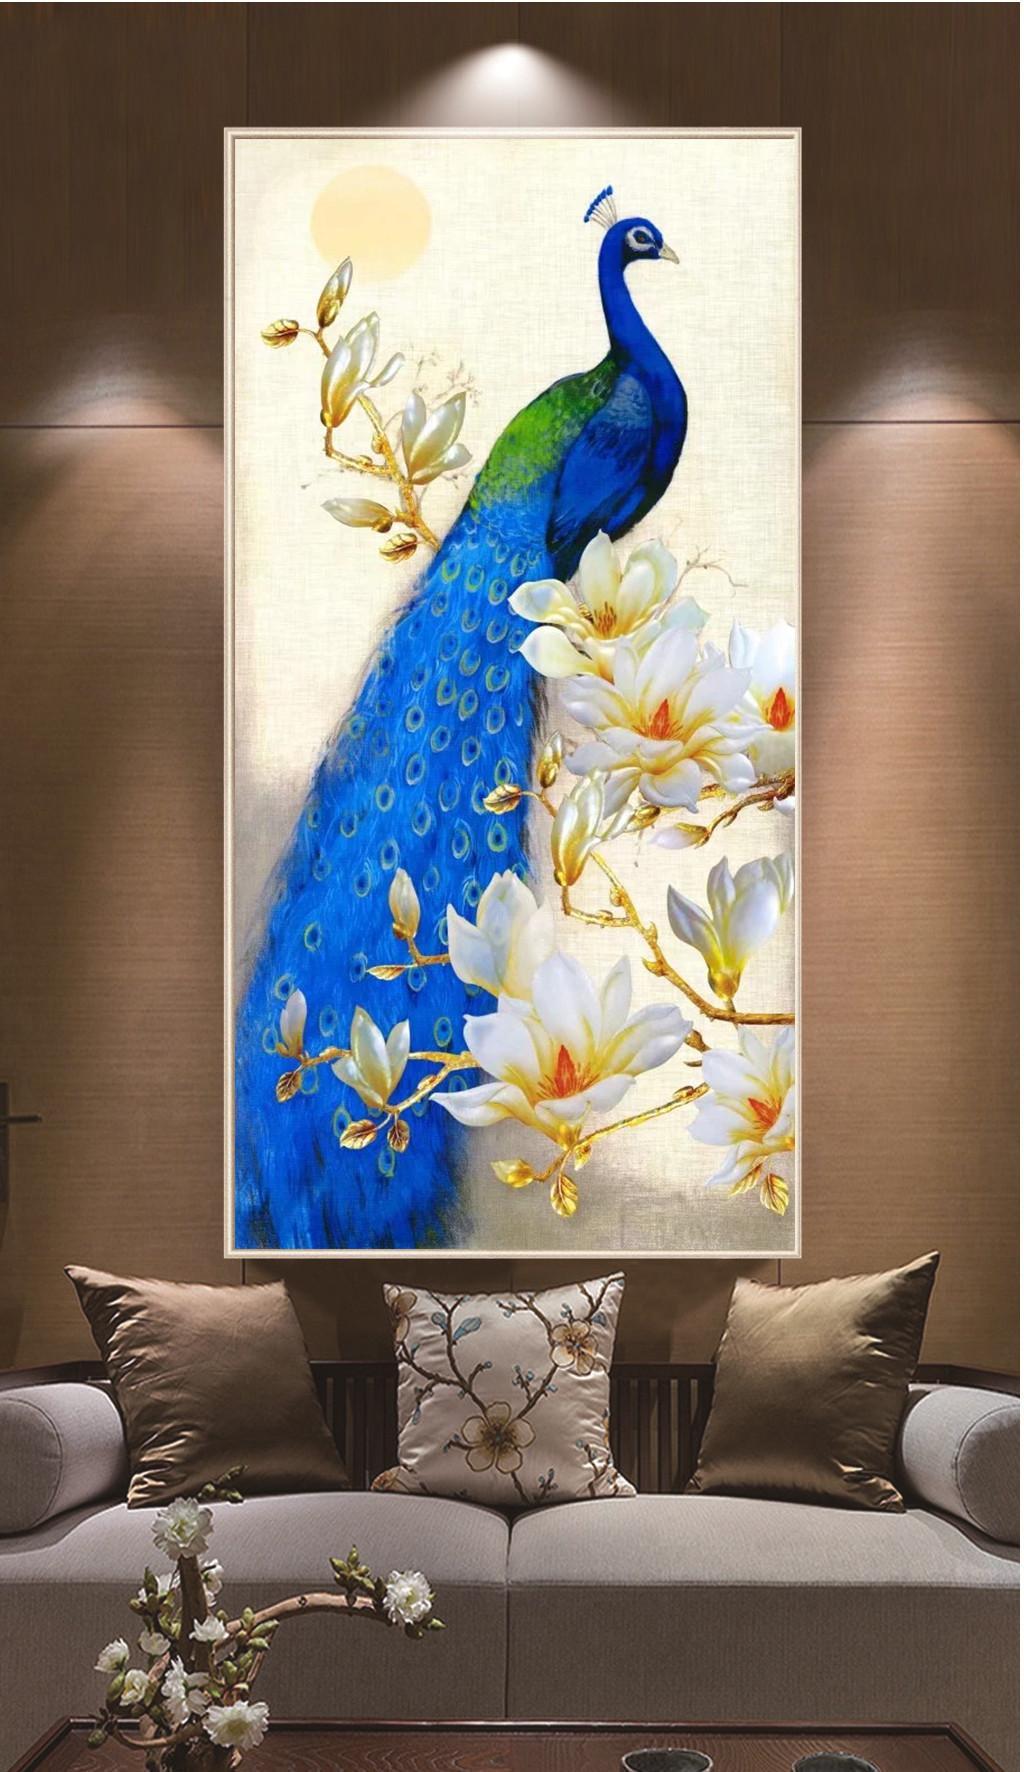 Product Show Beautiful Flower Bird Waterfall 39739 Hd